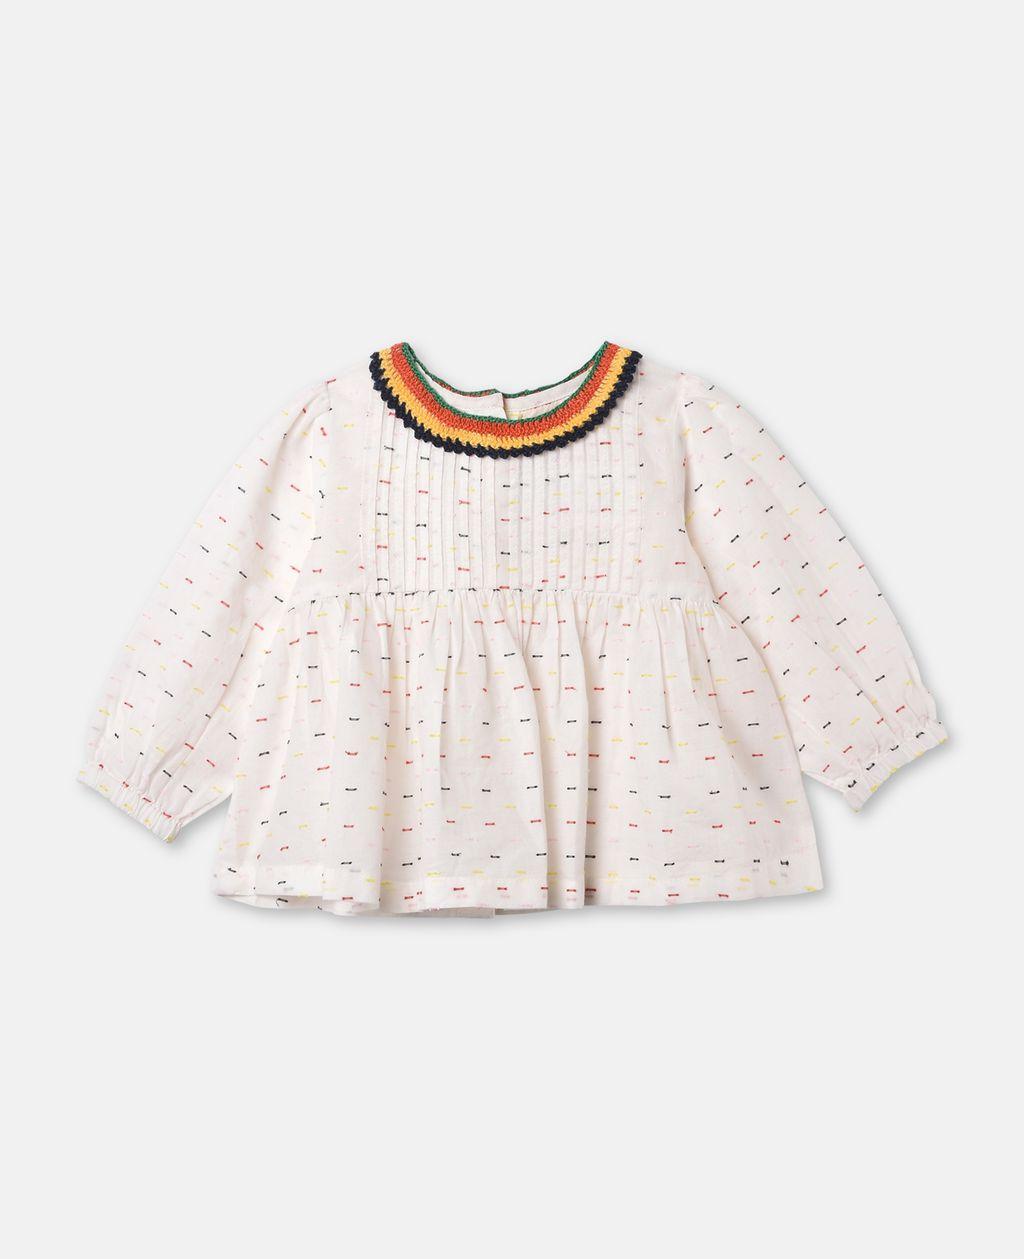 Juliana Crochet Top